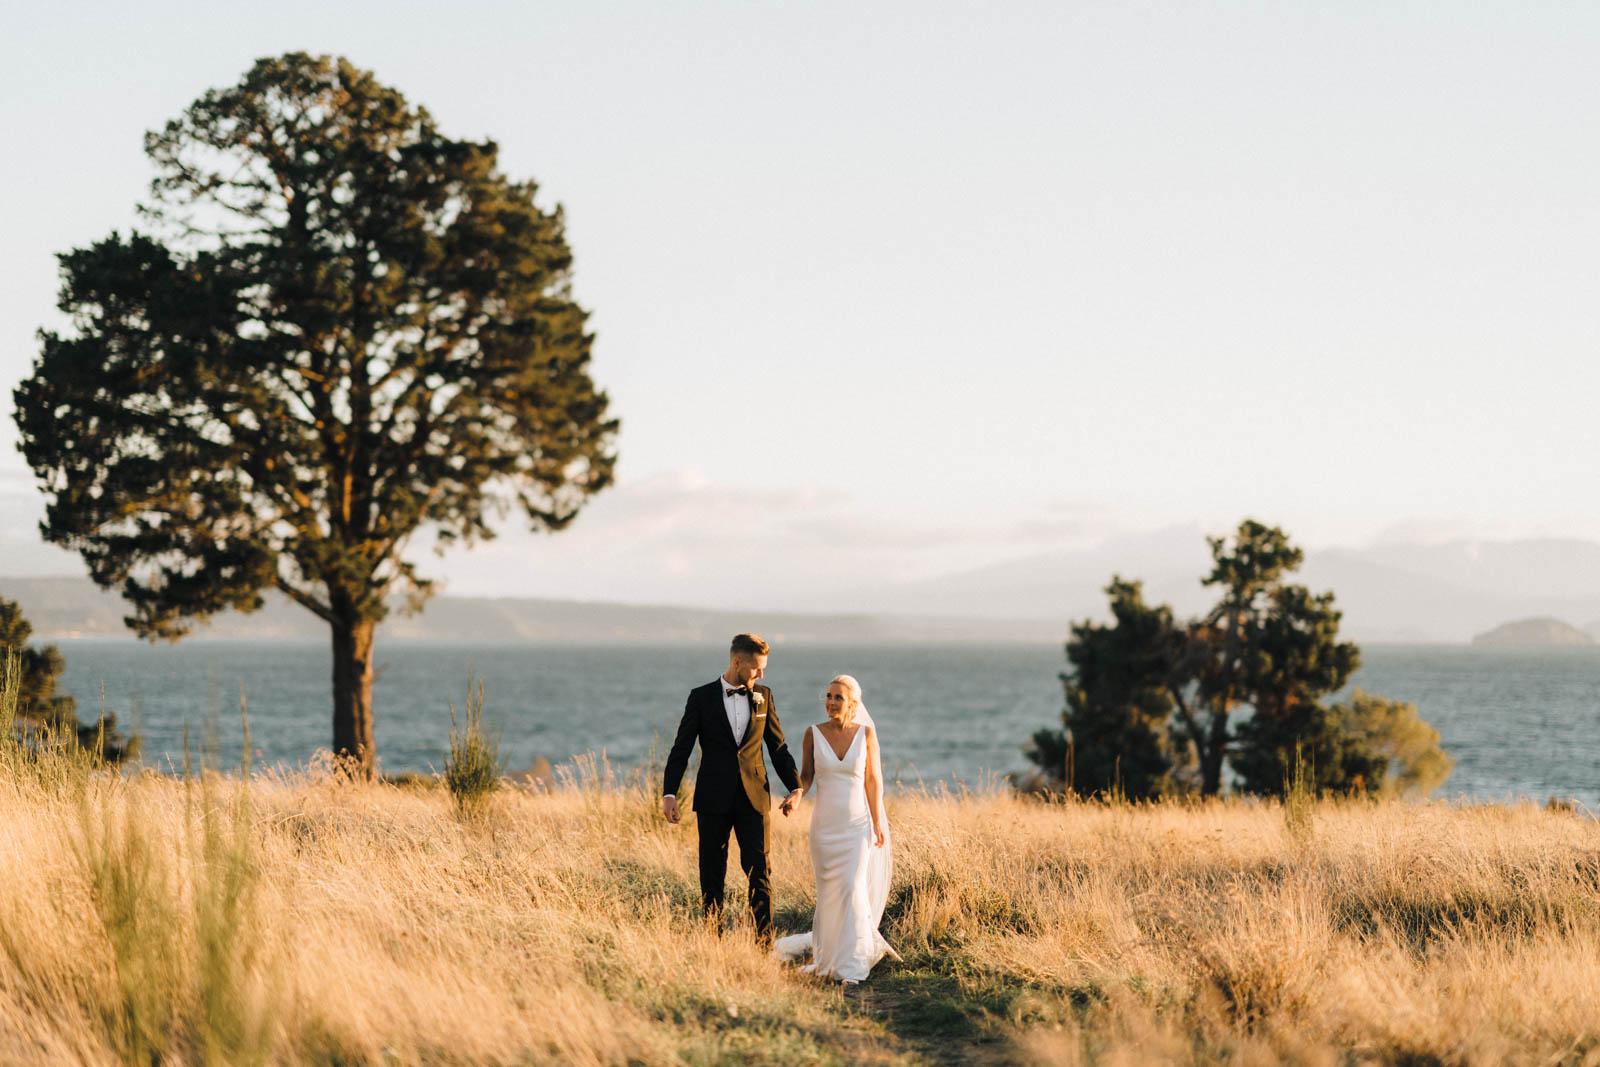 newfound-k-s-hilton-taupo-wedding-photographer-081